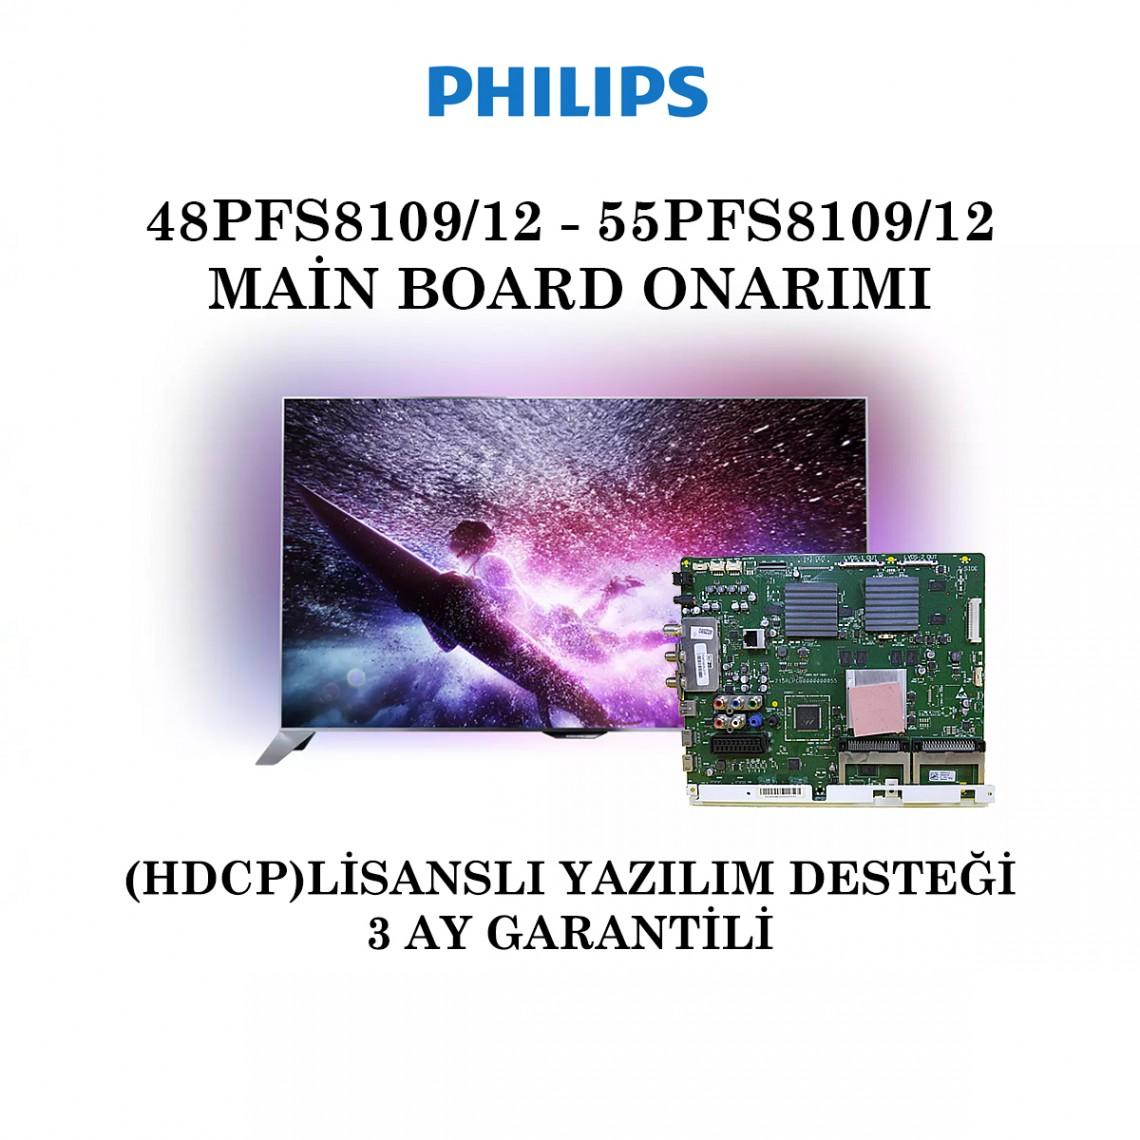 PHILIPS , 715RLPCB0000000055 , QV14.1E , 48PFS8109/12 , 55PFS8109/12 , Main Board Onarımı